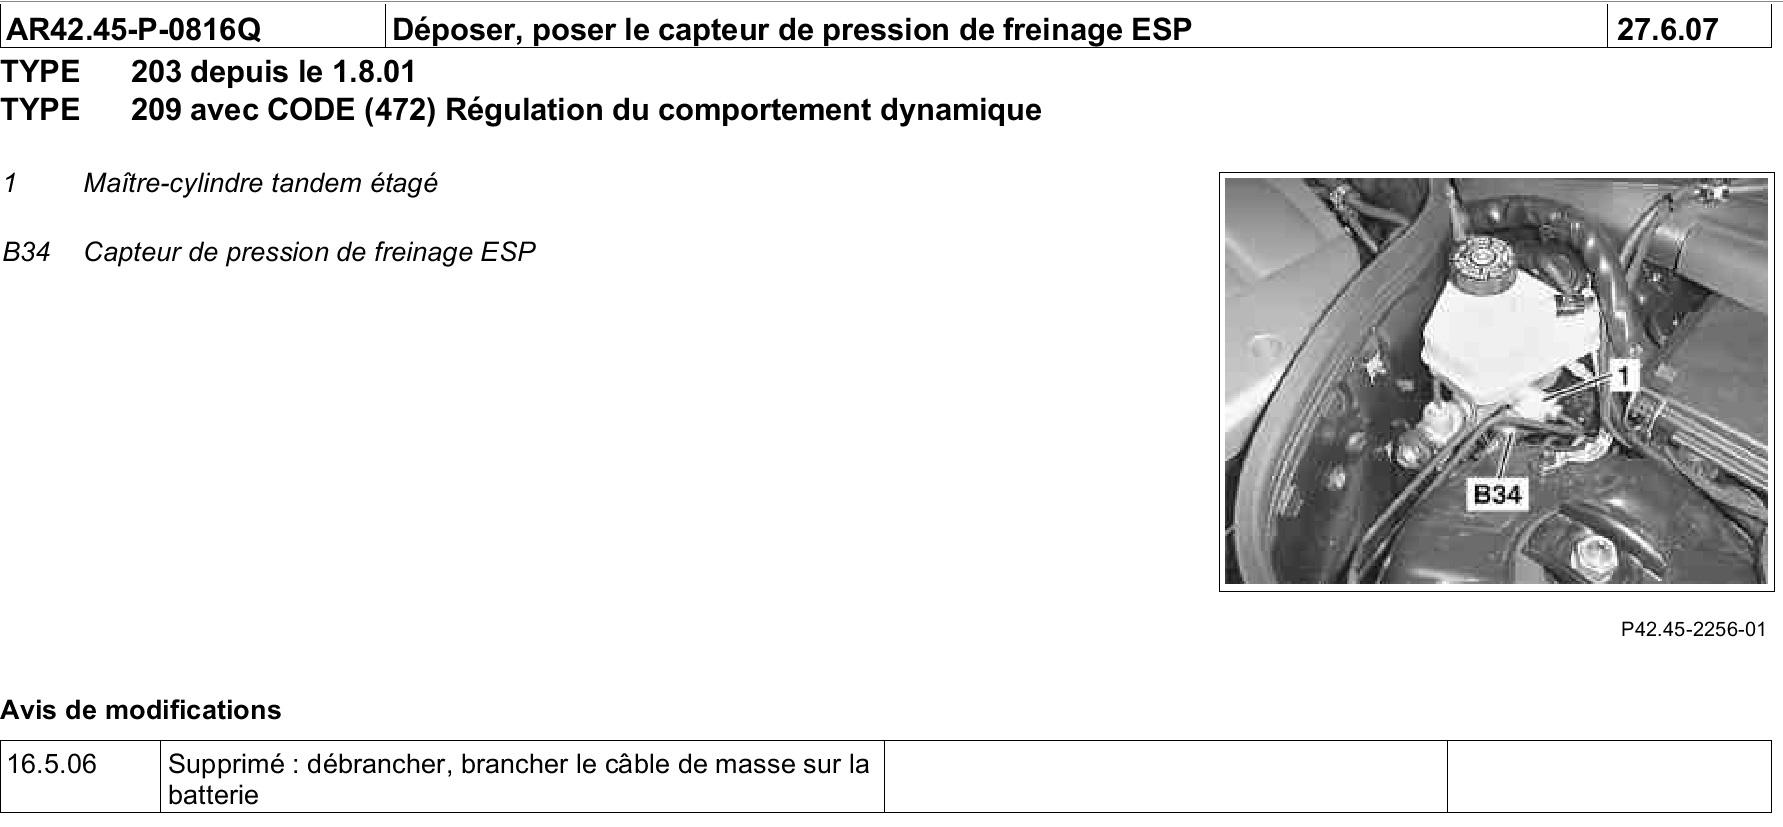 Depose-du-capteur-pression-freinage-ESP-W203-jpg.jpg